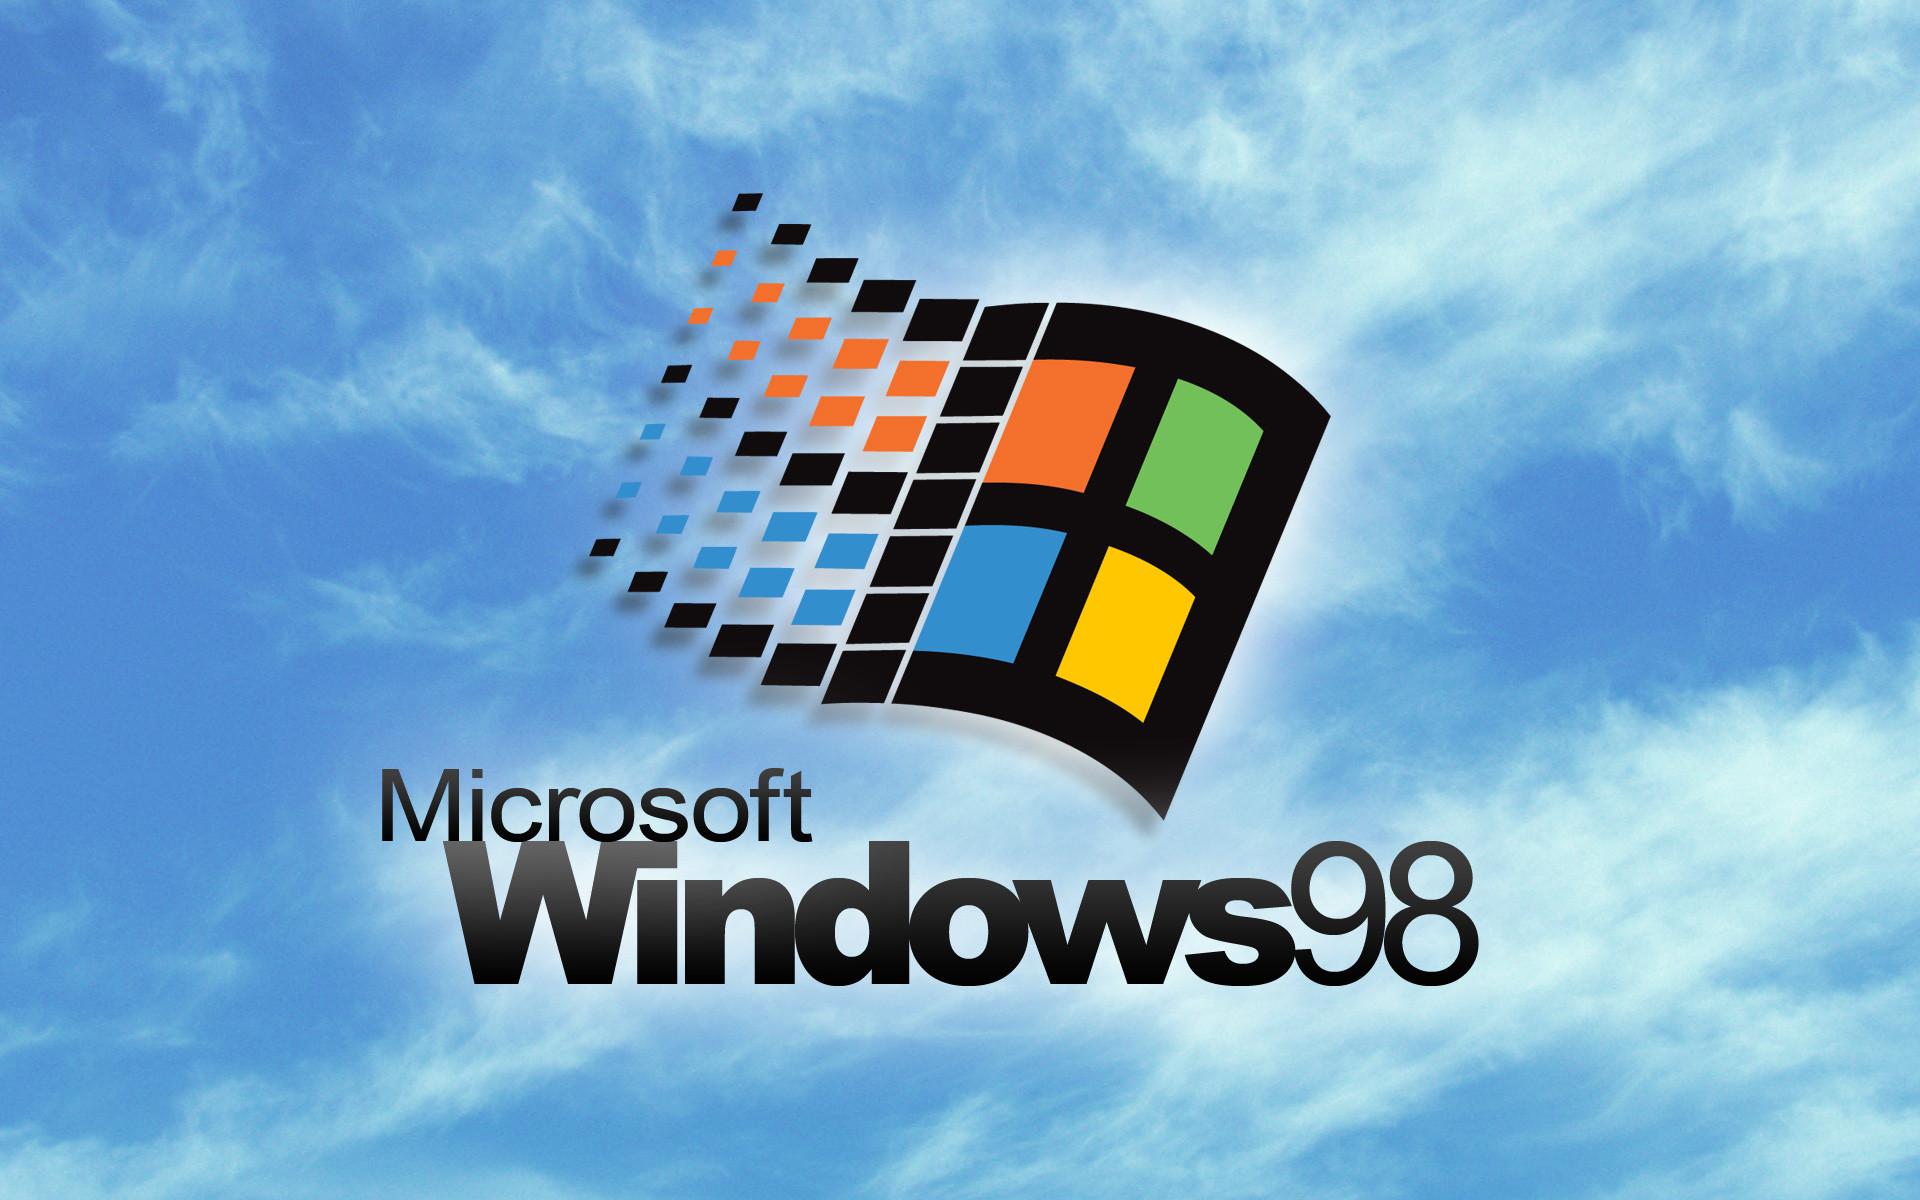 Windows 95 Widescreen Wallpaper – OS Customization, Tips and … | Download  Wallpaper | Pinterest | Windows 95 and Wallpaper